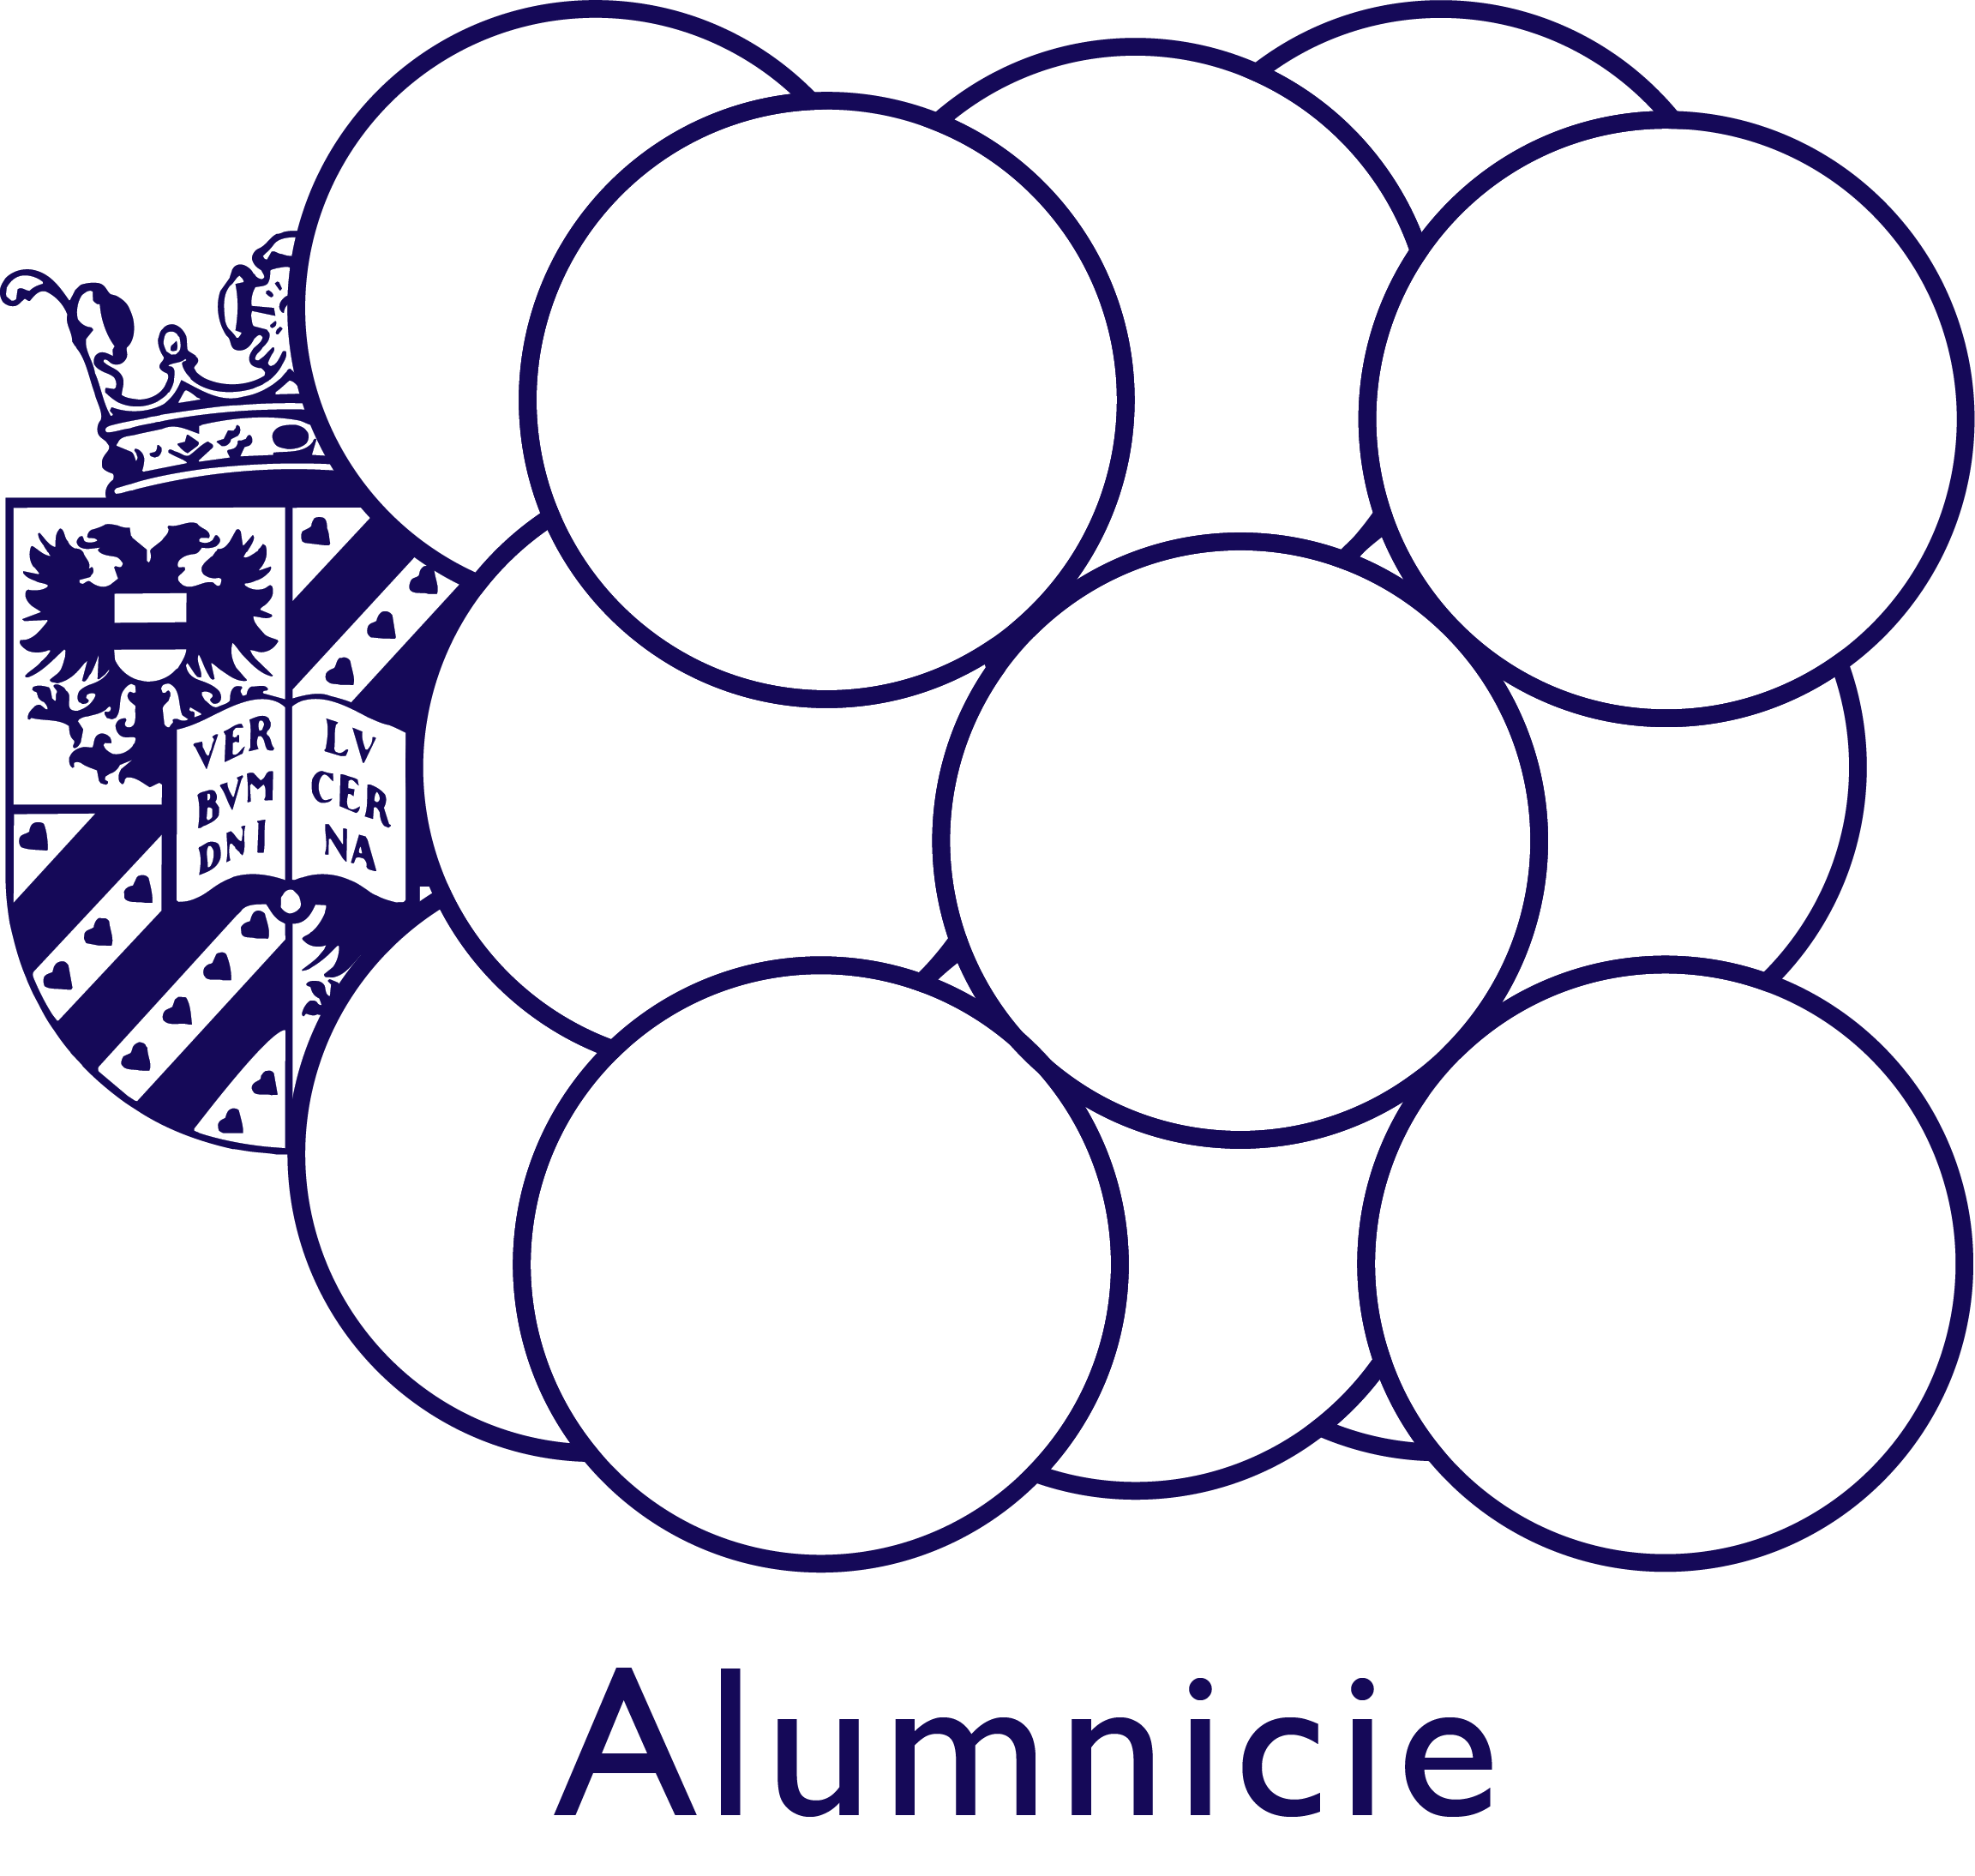 Alumnicie's logo